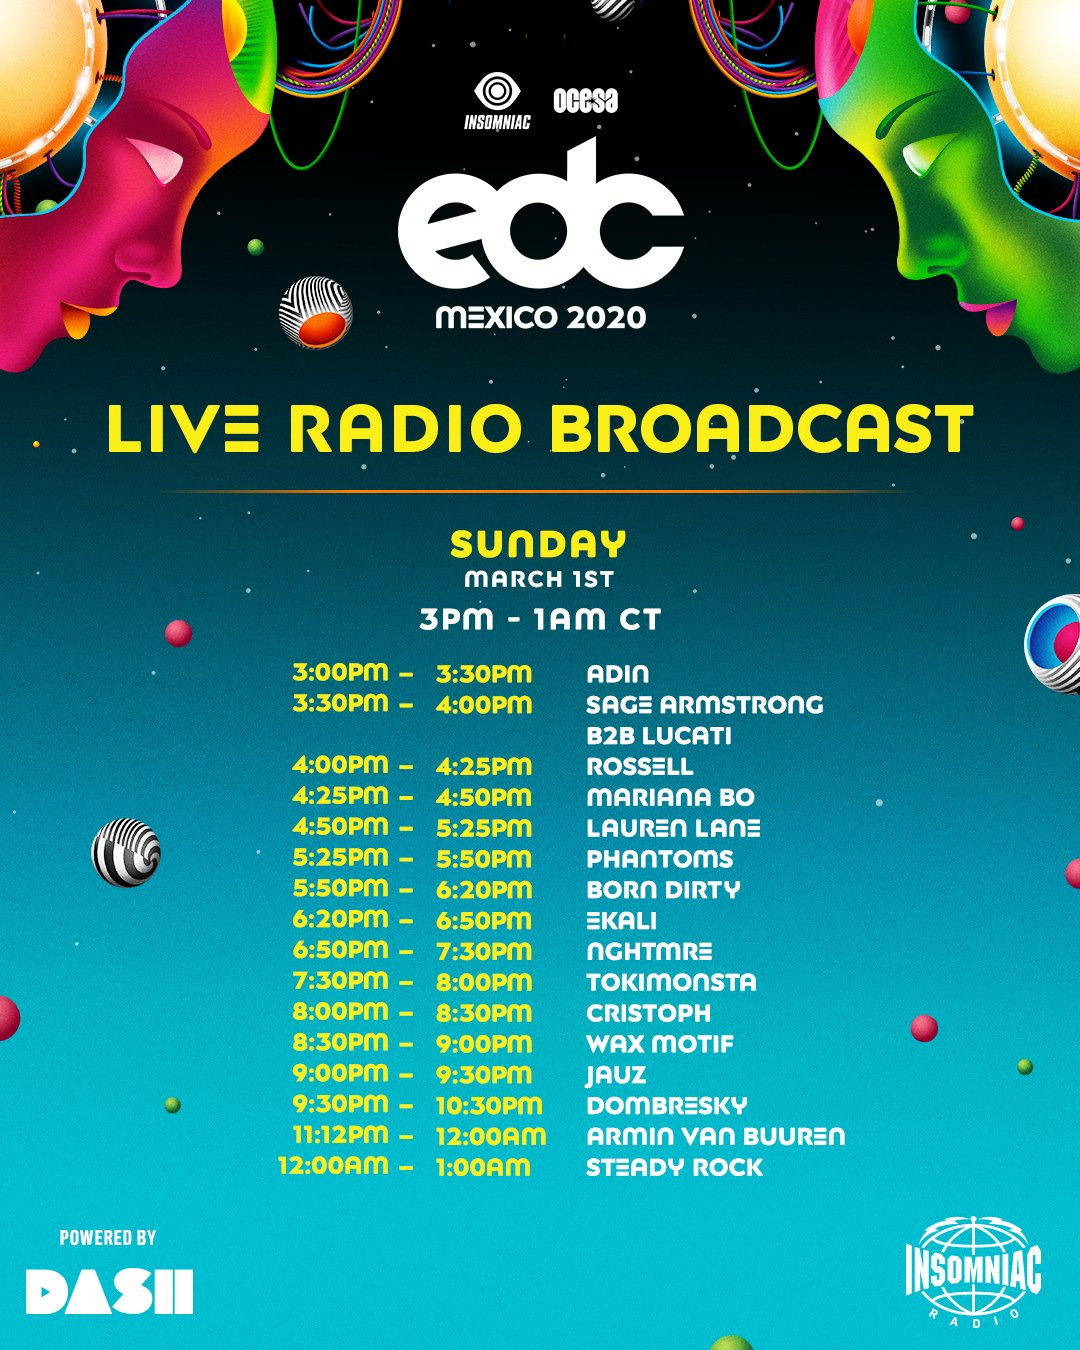 EDC Mexico 2020 Insomniac Radio Broadcast - Sunday